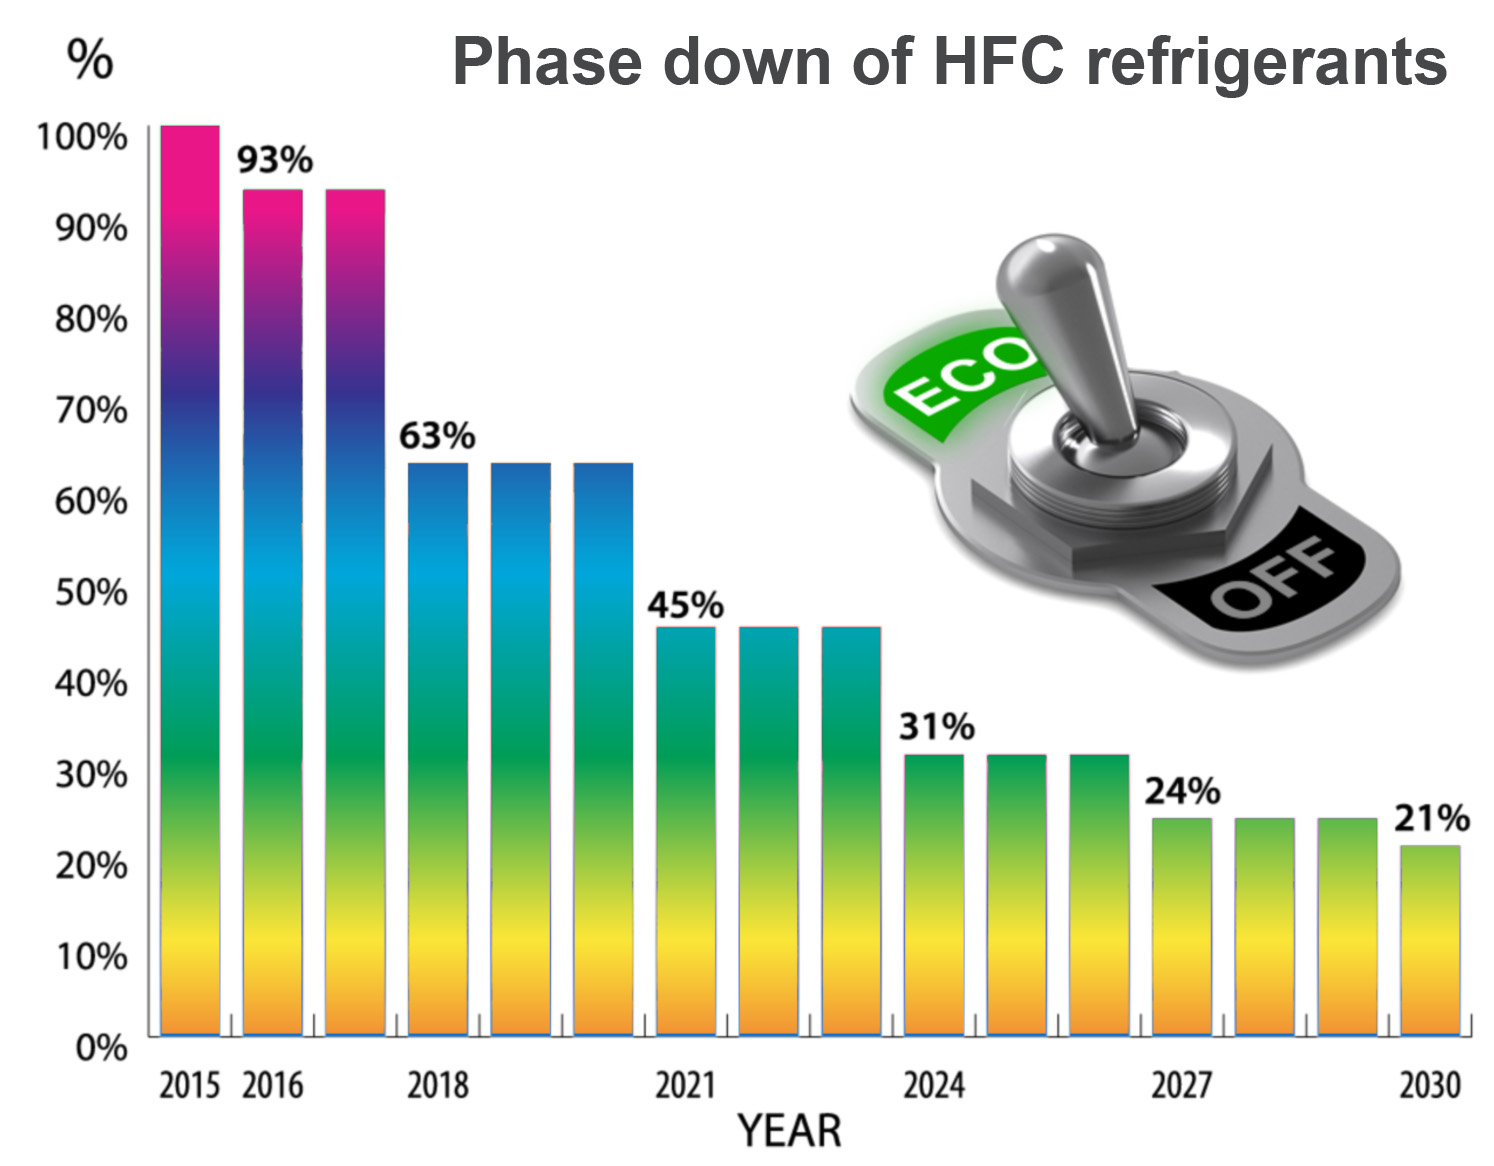 HFC_refrigerants